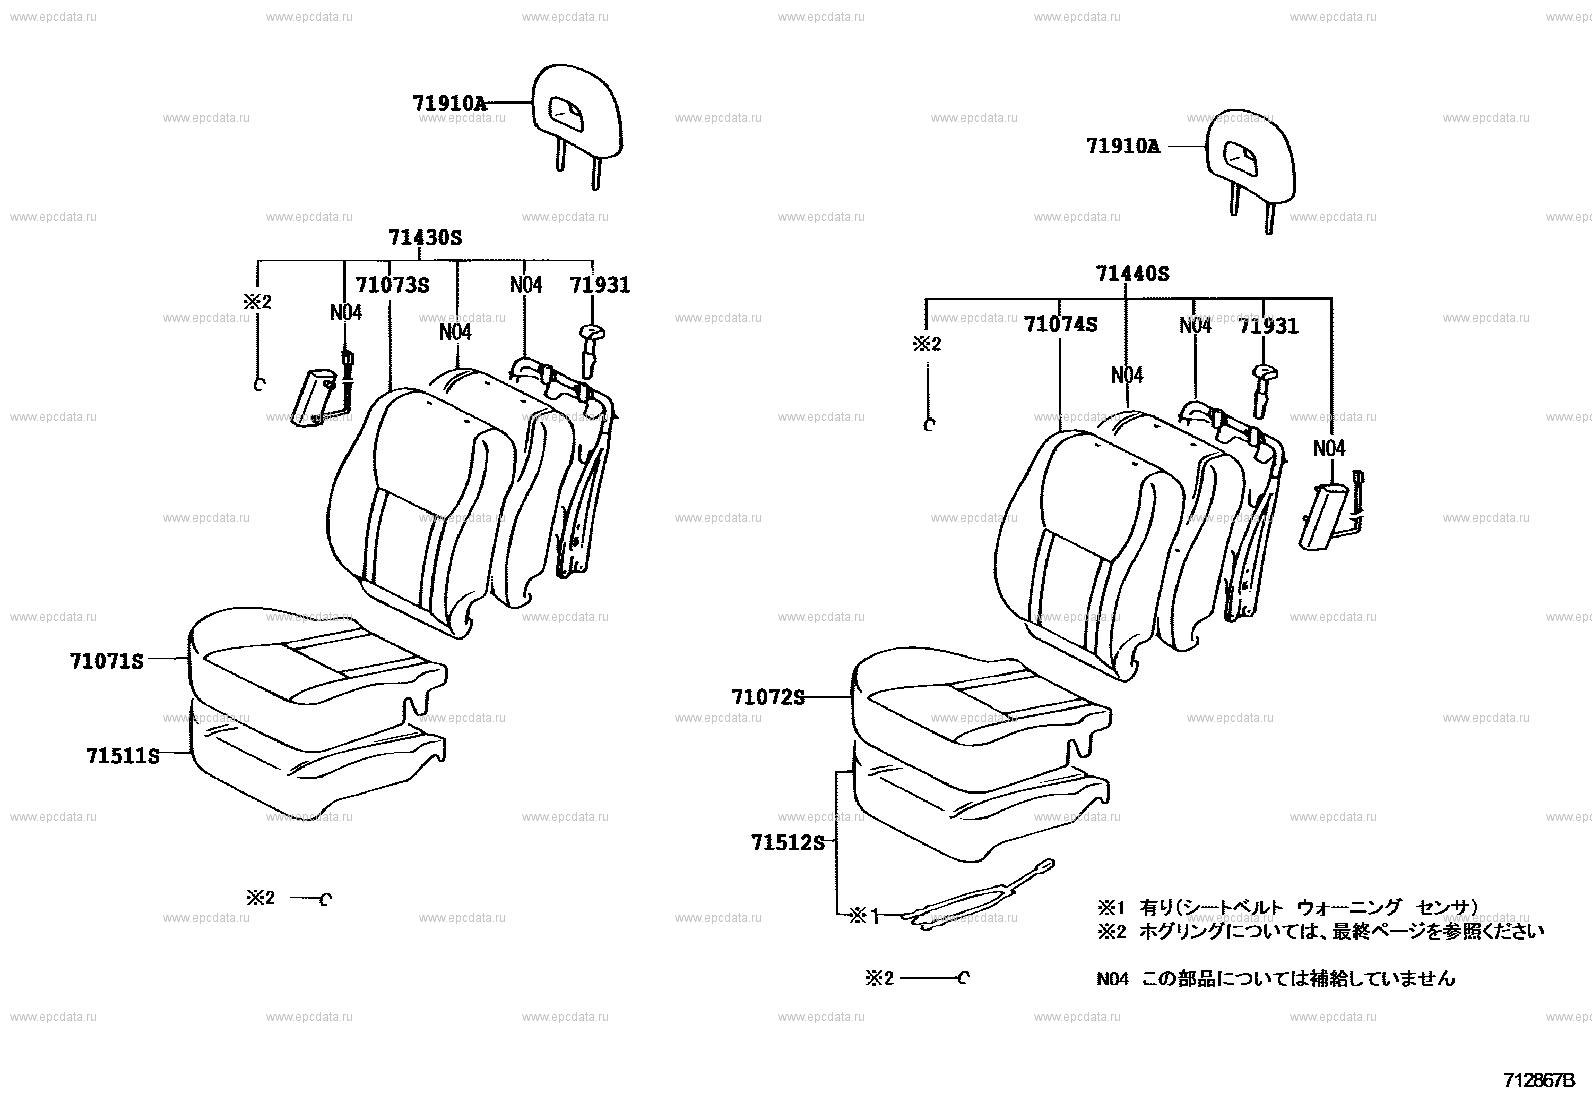 Orange Officer 07 - Rear Admiral, Lower Half American Shifter 44528 Orange Metal Flake Shift Knob with 16mm x 1.5 Insert